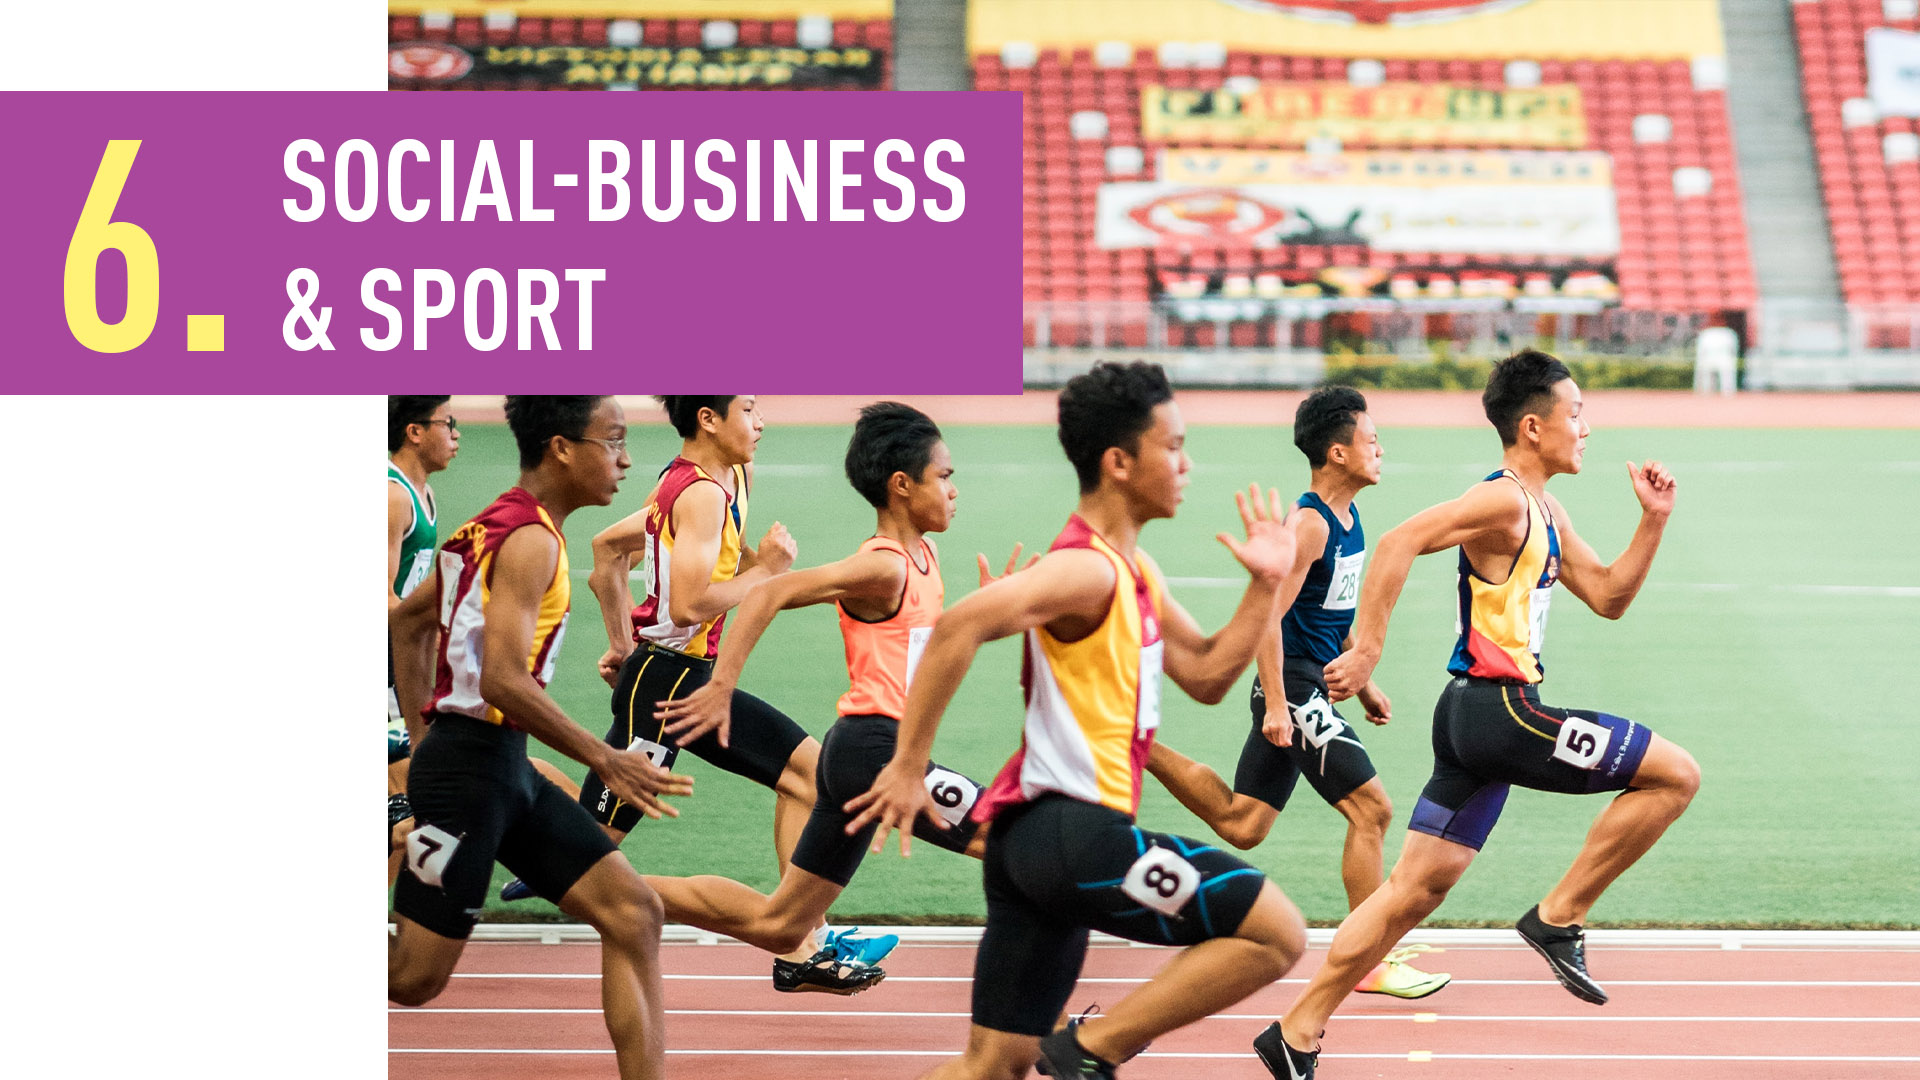 SOCIAL-BUSINESS & SPORT